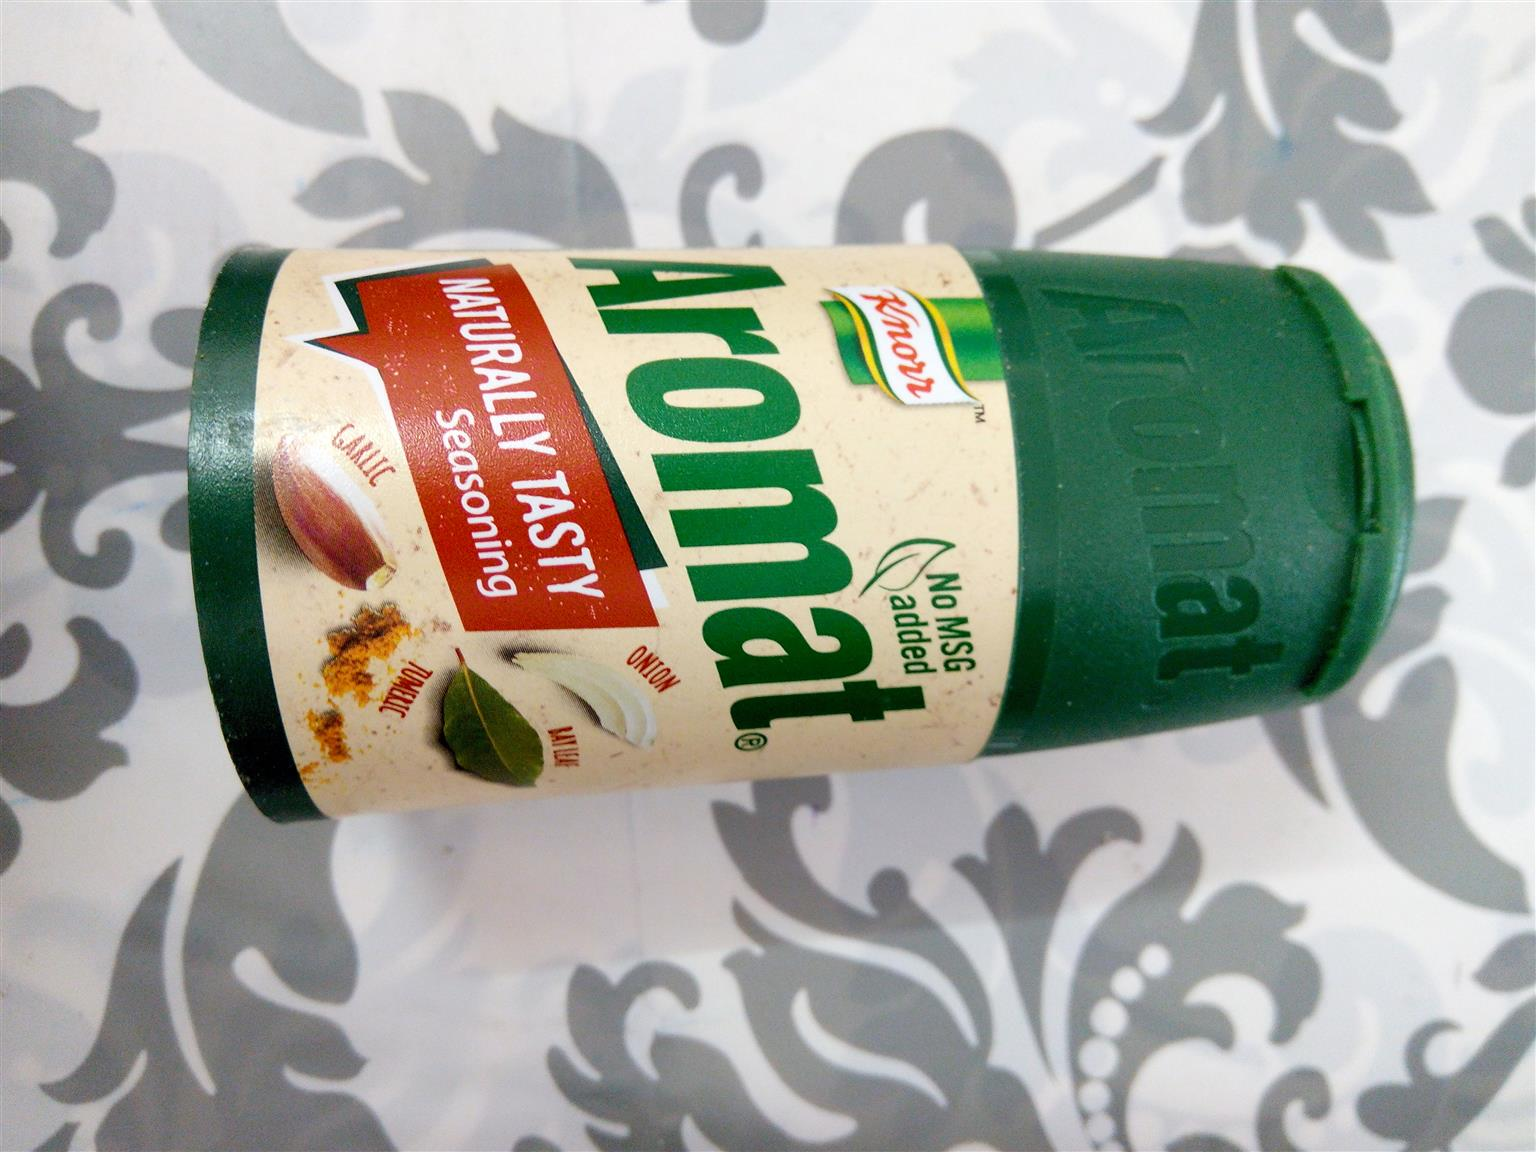 Knorr Aromat Naturally tasty seasoning 70g